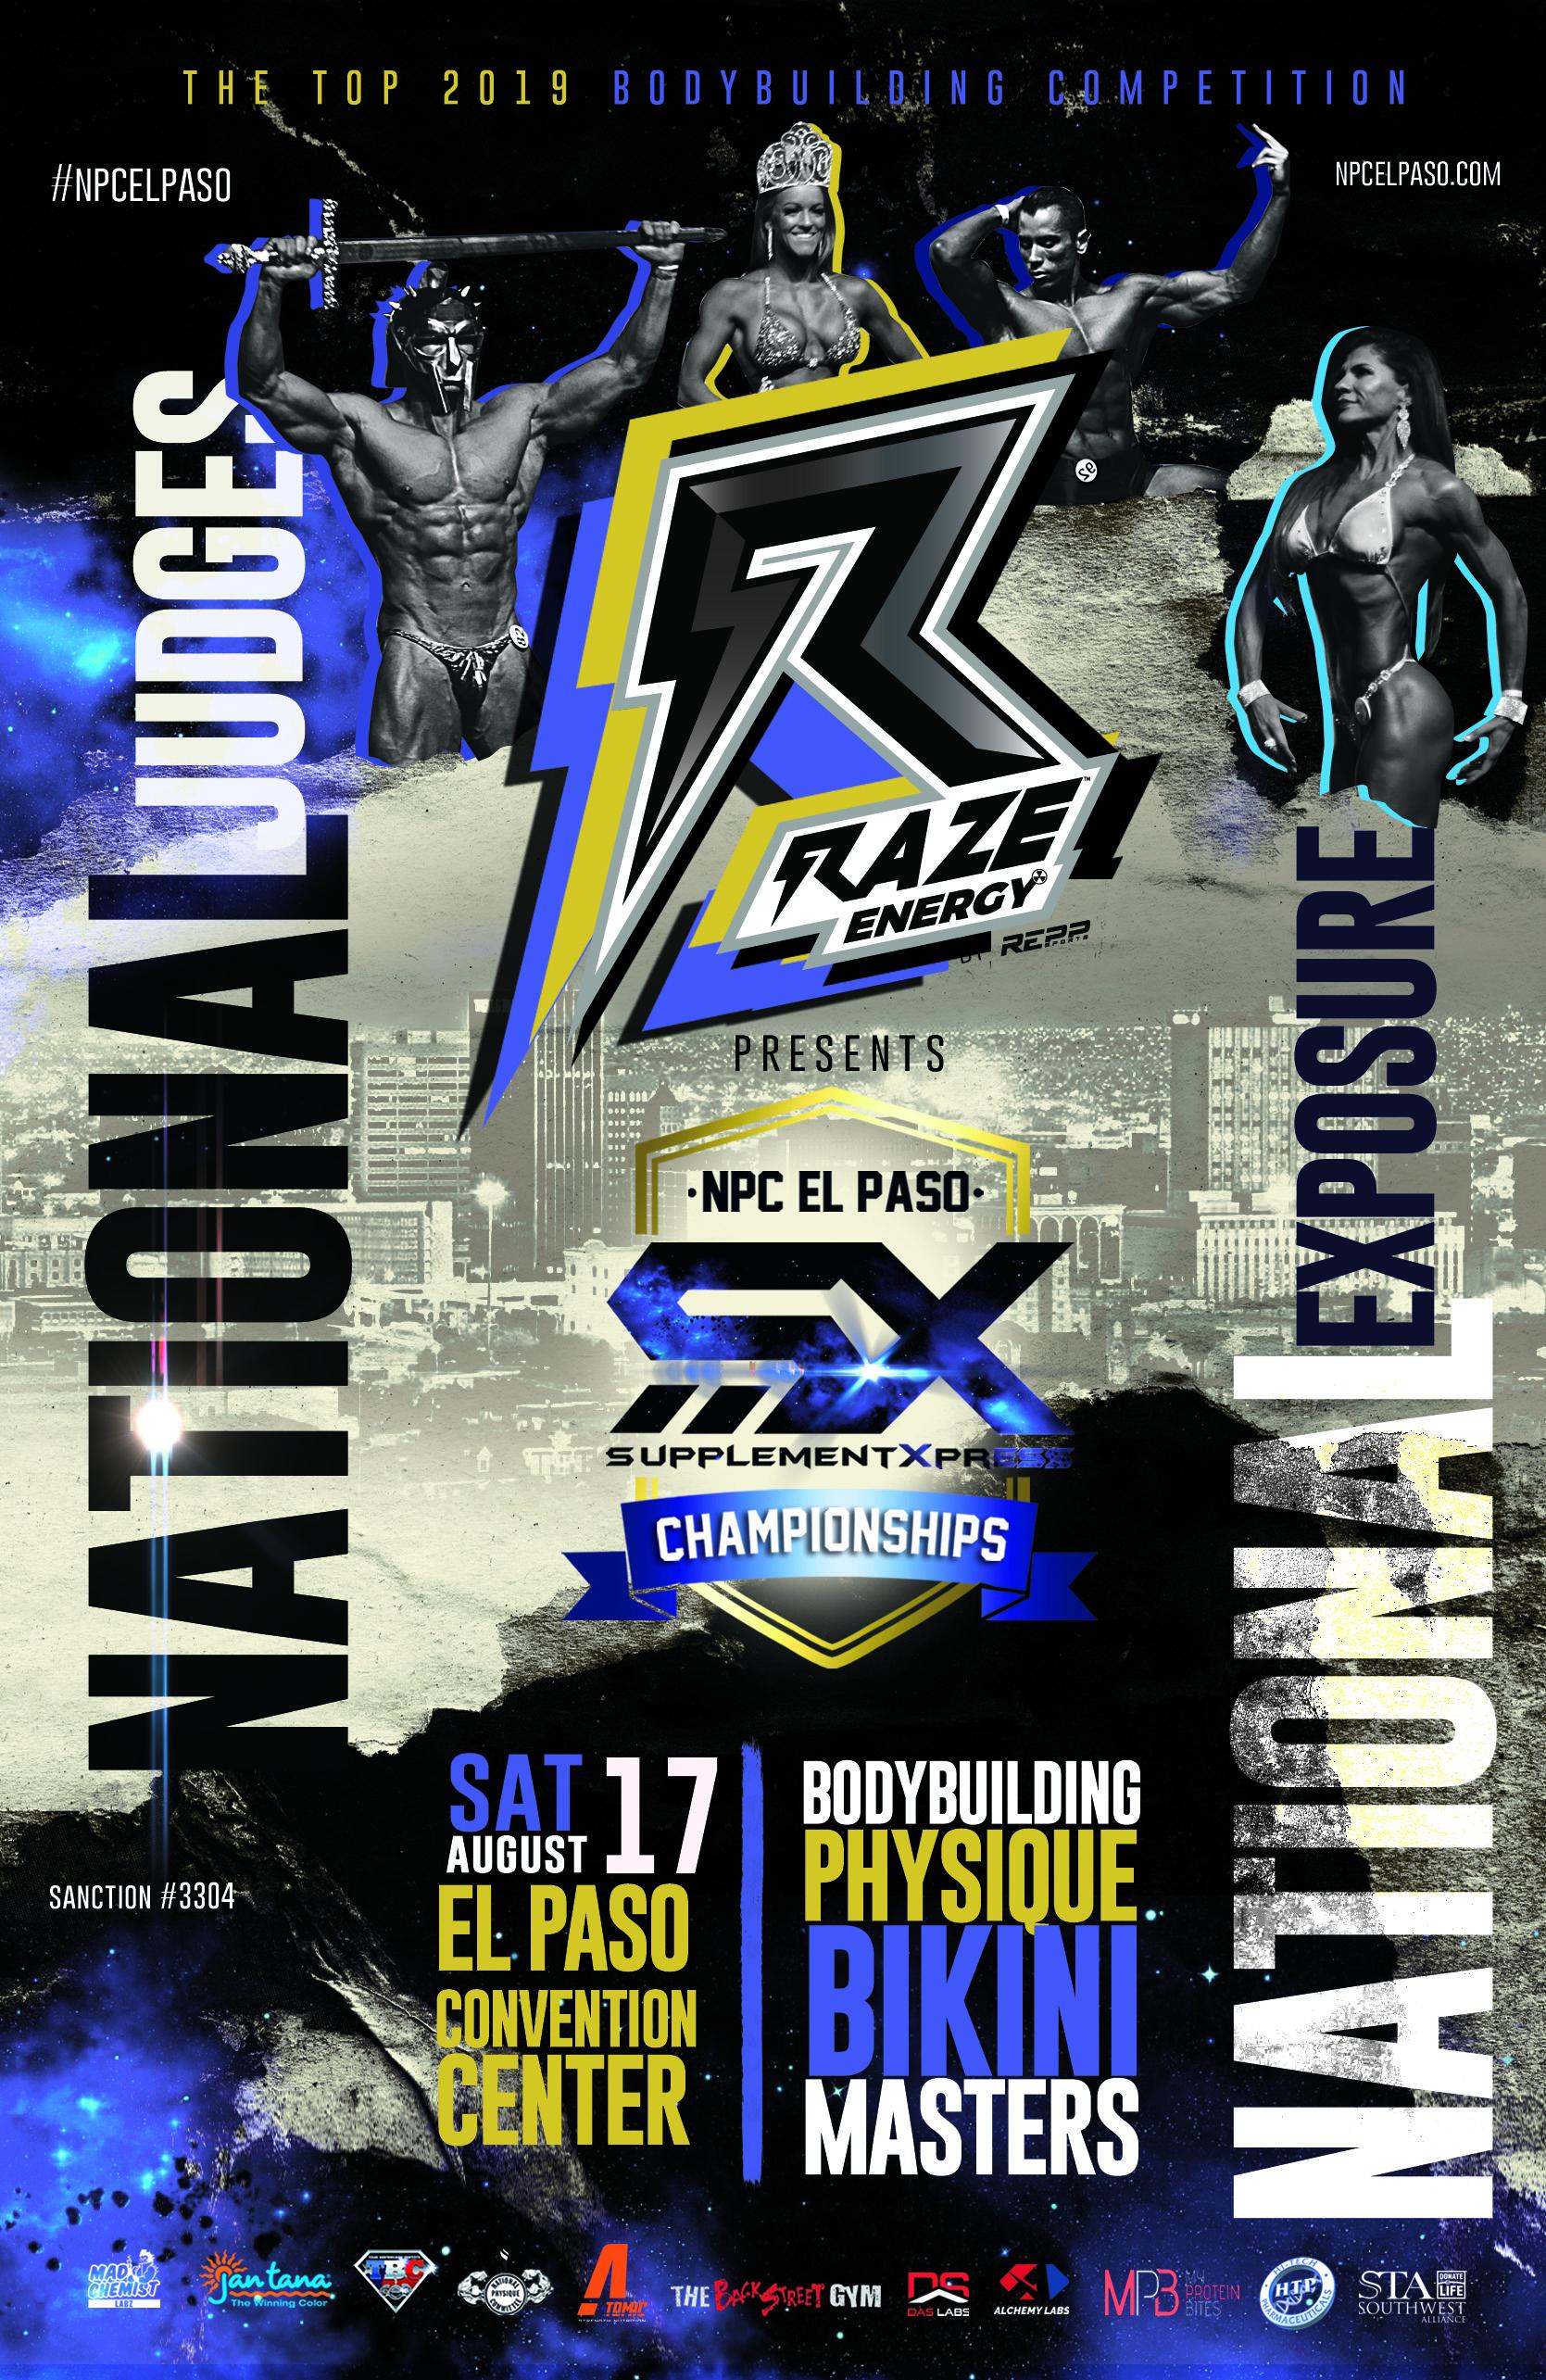 NPC El Paso, TX SX Championships at the El Paso Convention Center